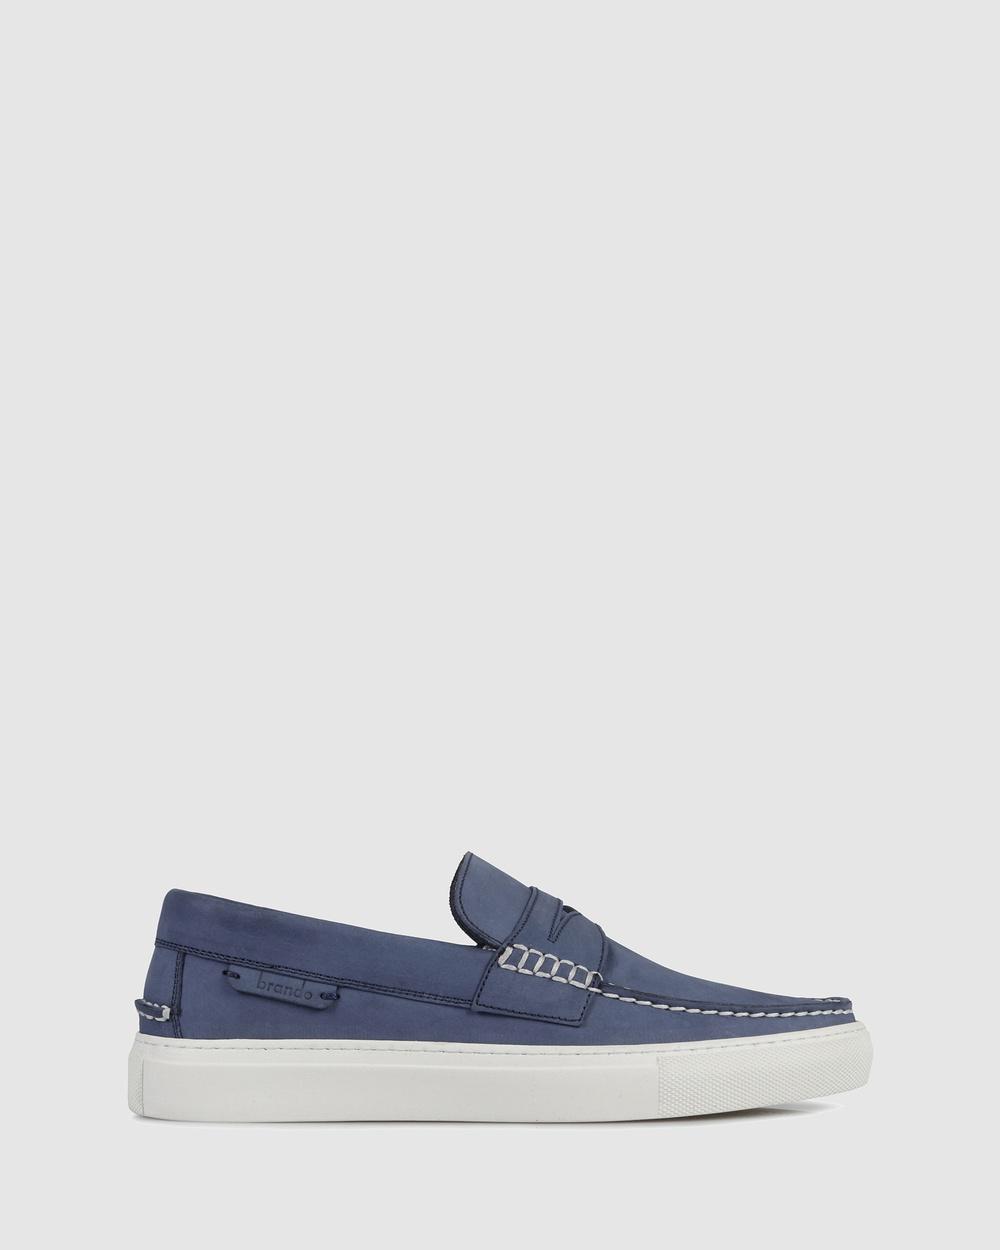 Brando Oscar Slip on sneakers Casual Shoes BLUE-401 Slip-on